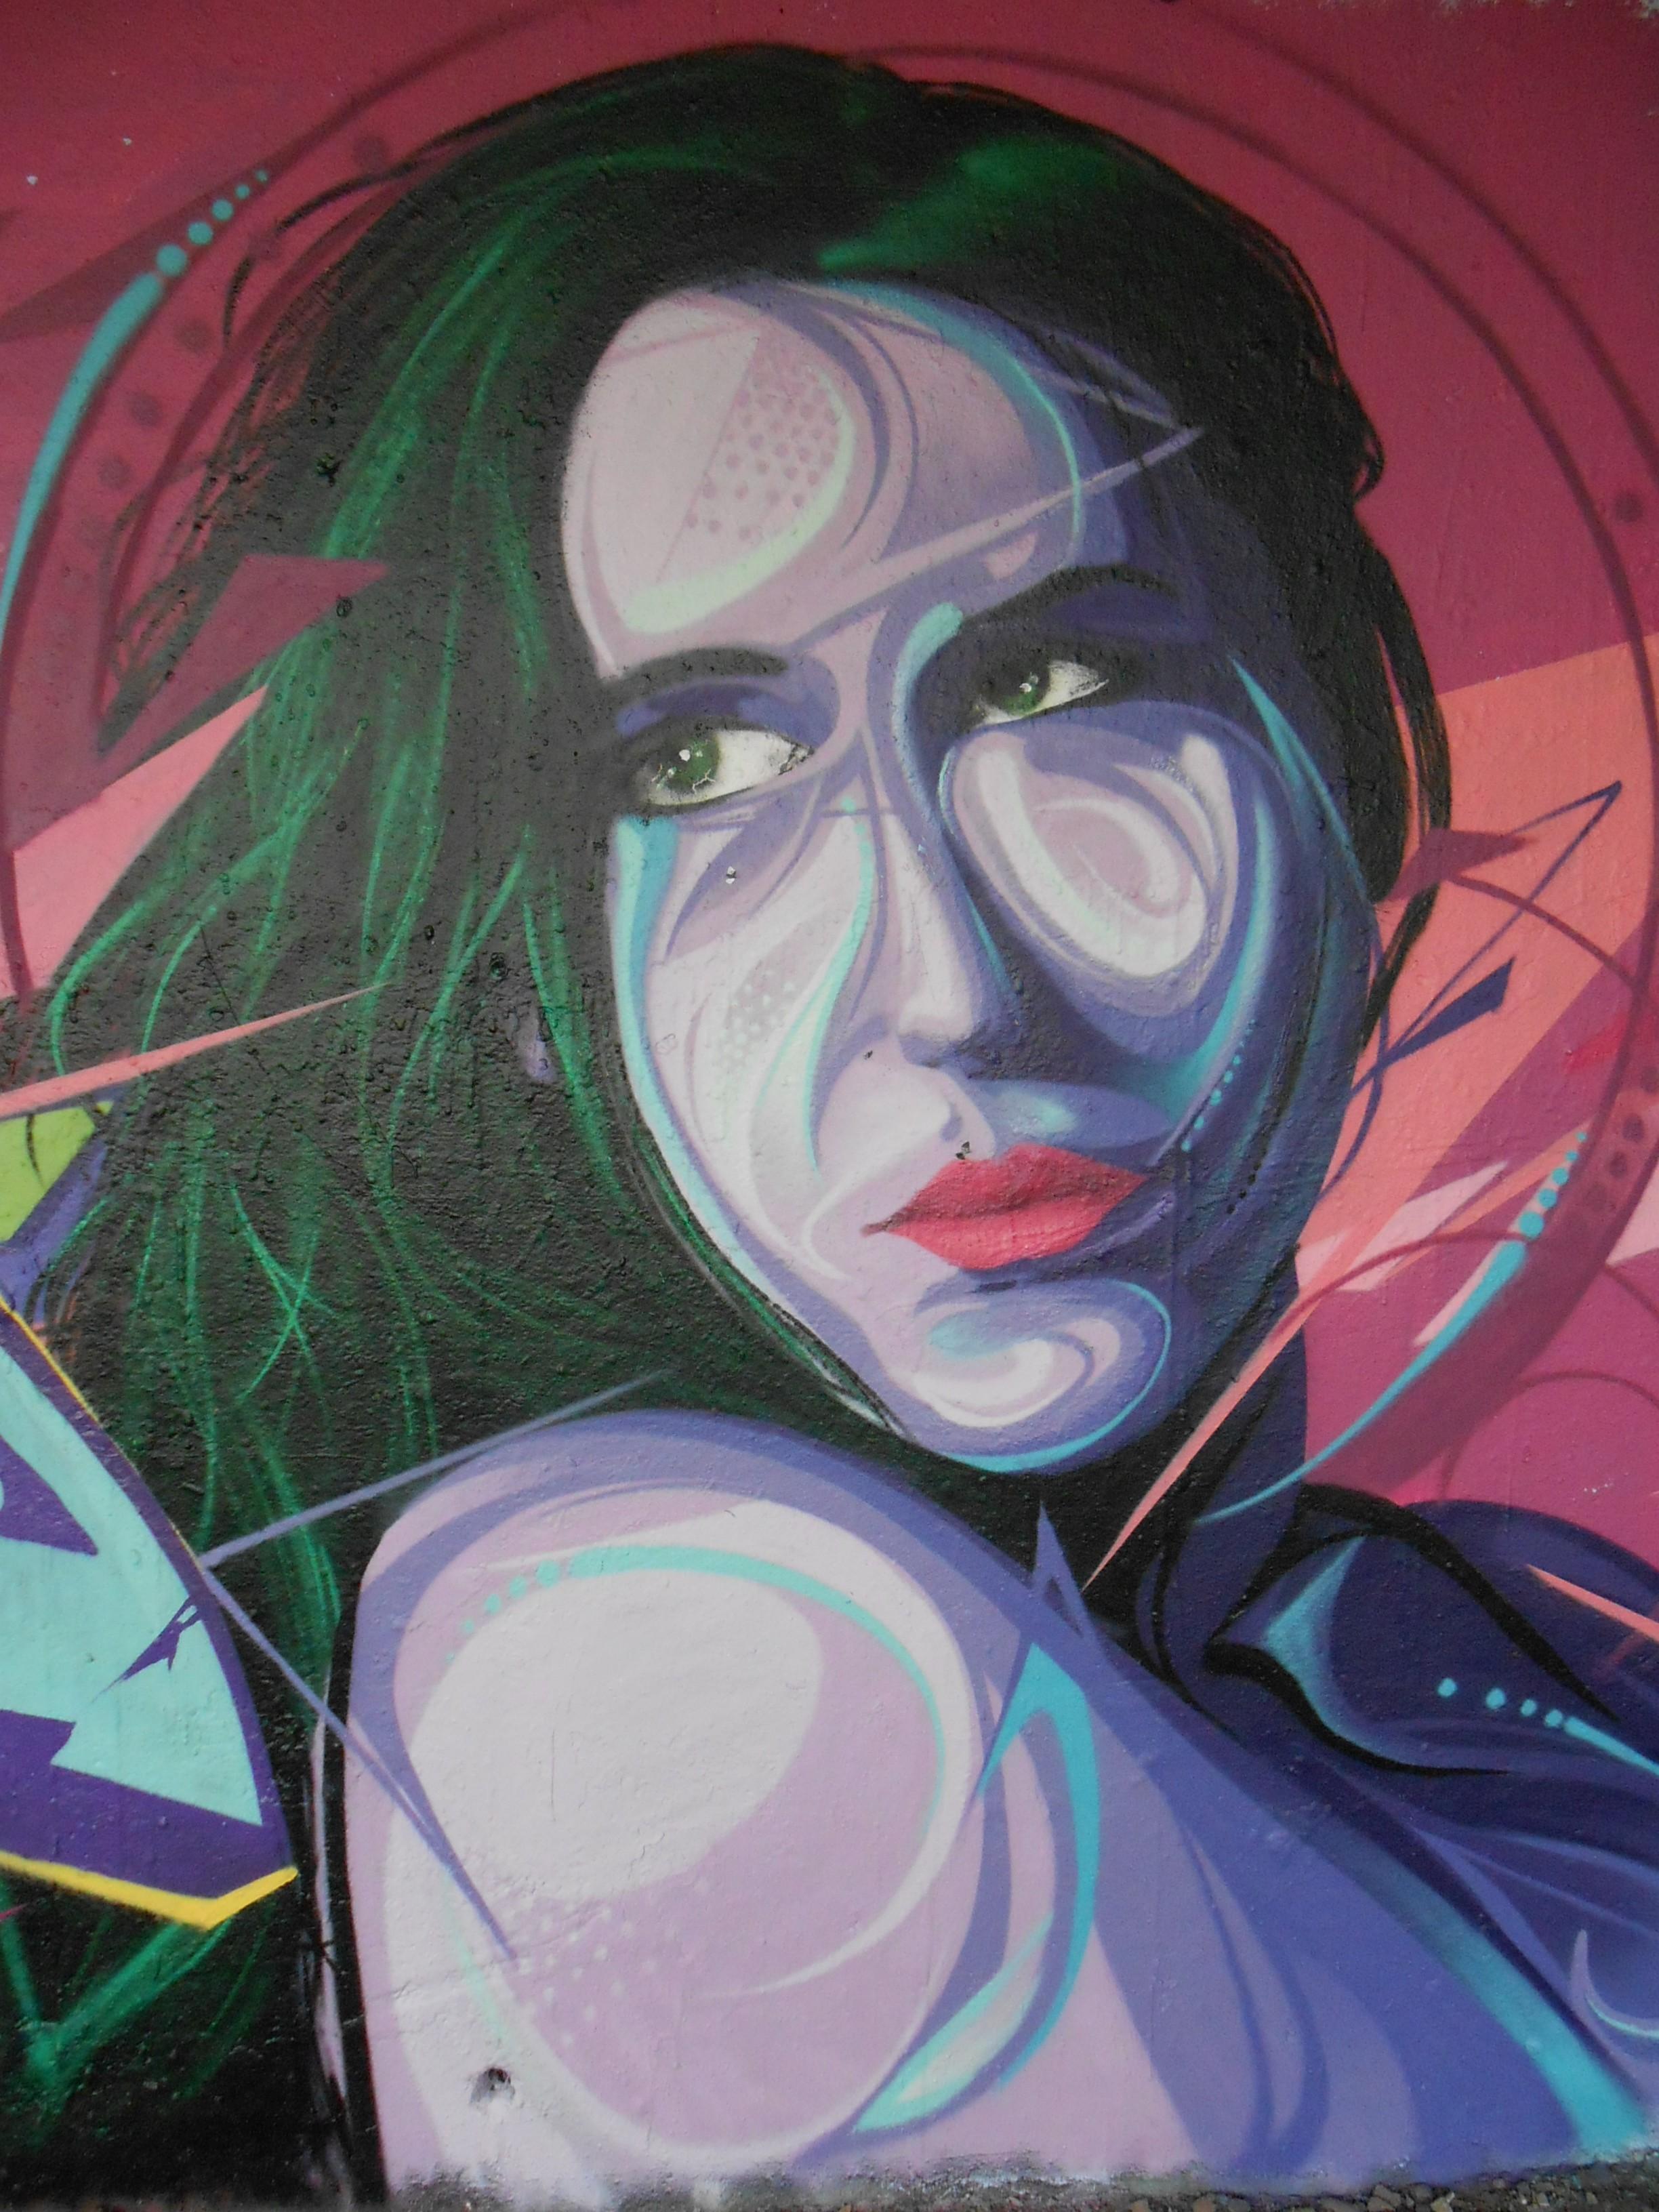 Basik, Wyker, Mesh-graffiti-besancon-juill2014 (5)